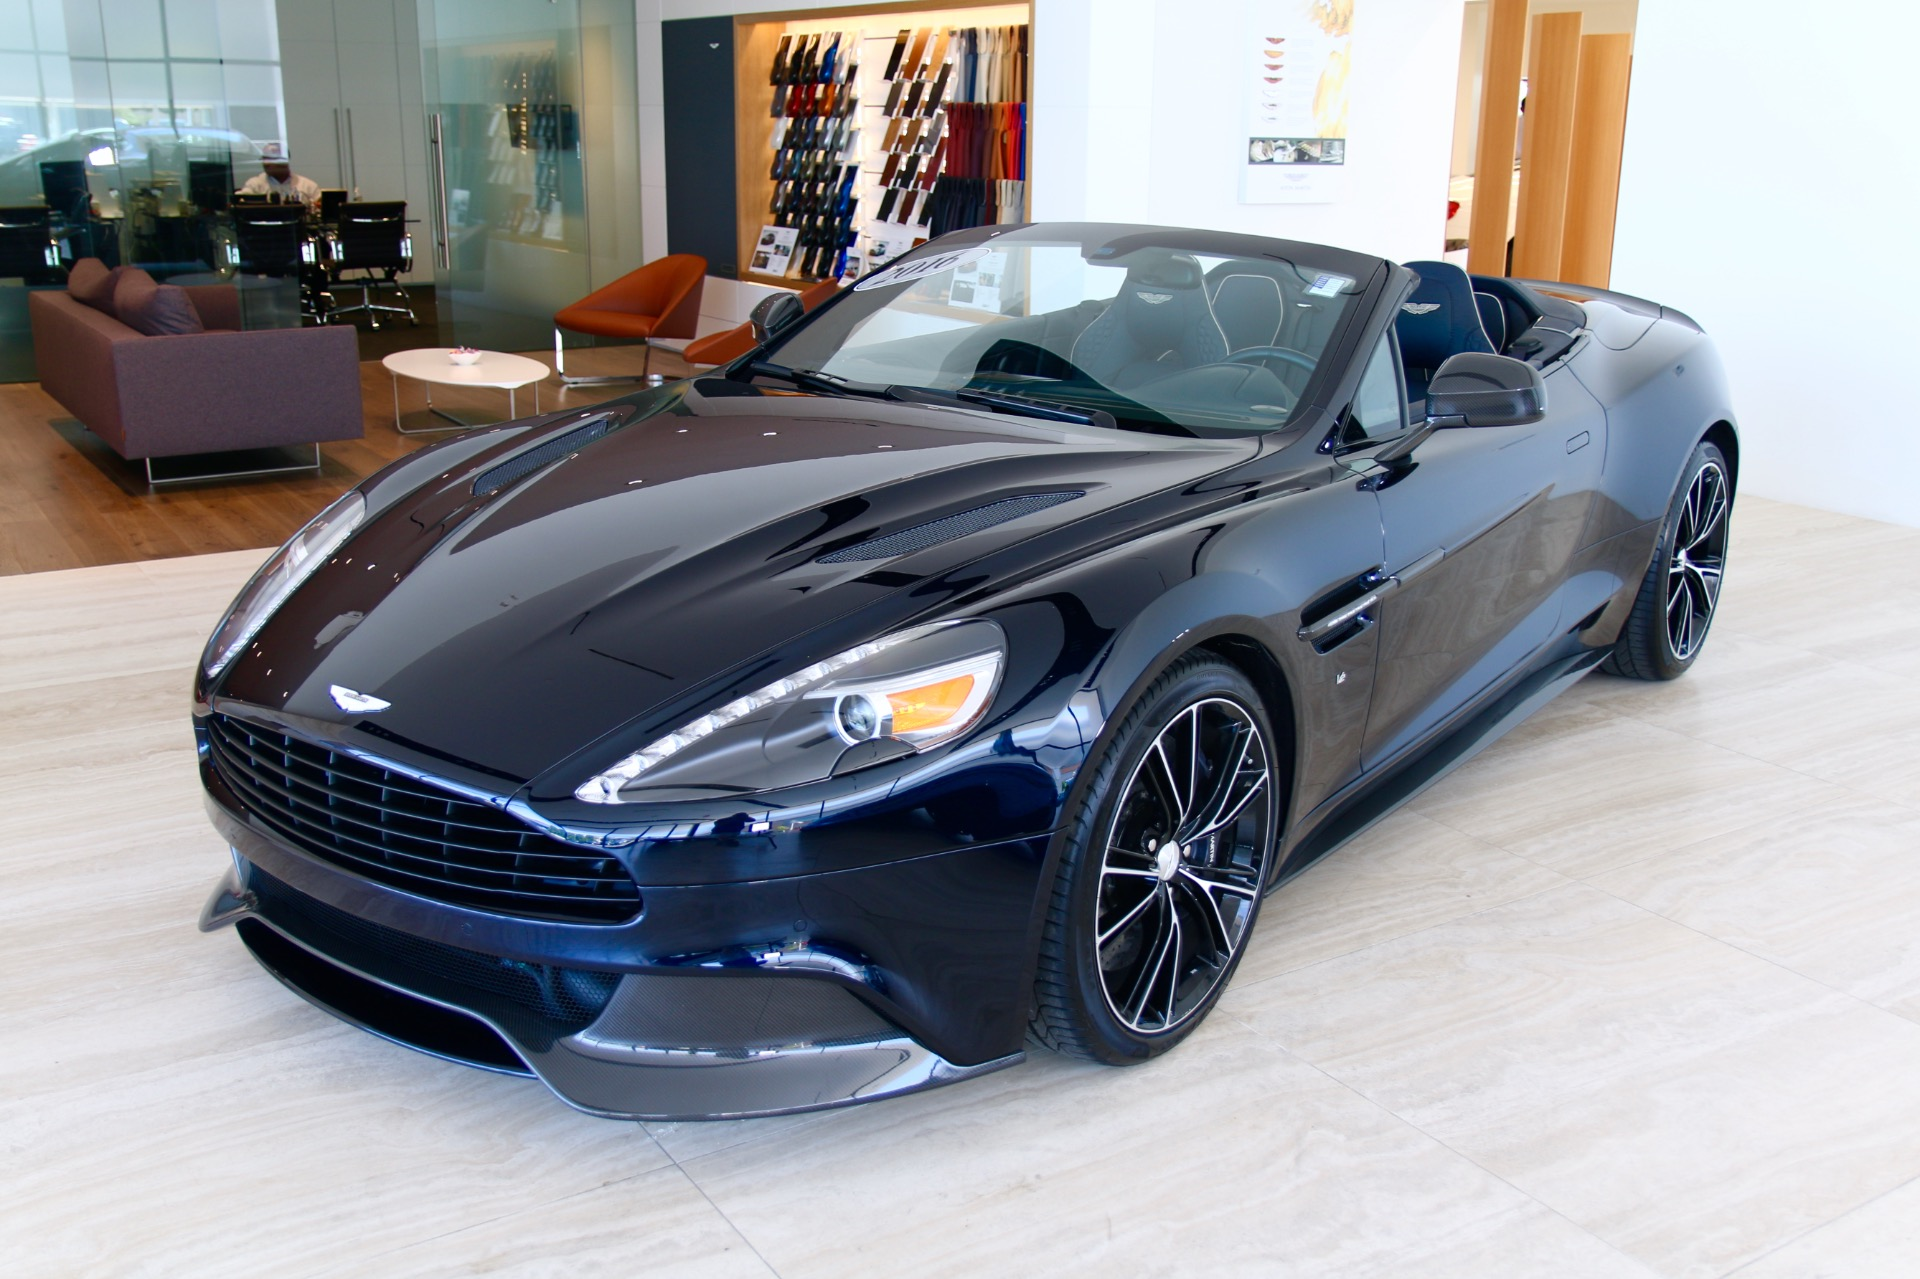 2016 Aston Martin Vanquish Volante Stock Po3168 For Sale Near Vienna Va Va Aston Martin Dealer